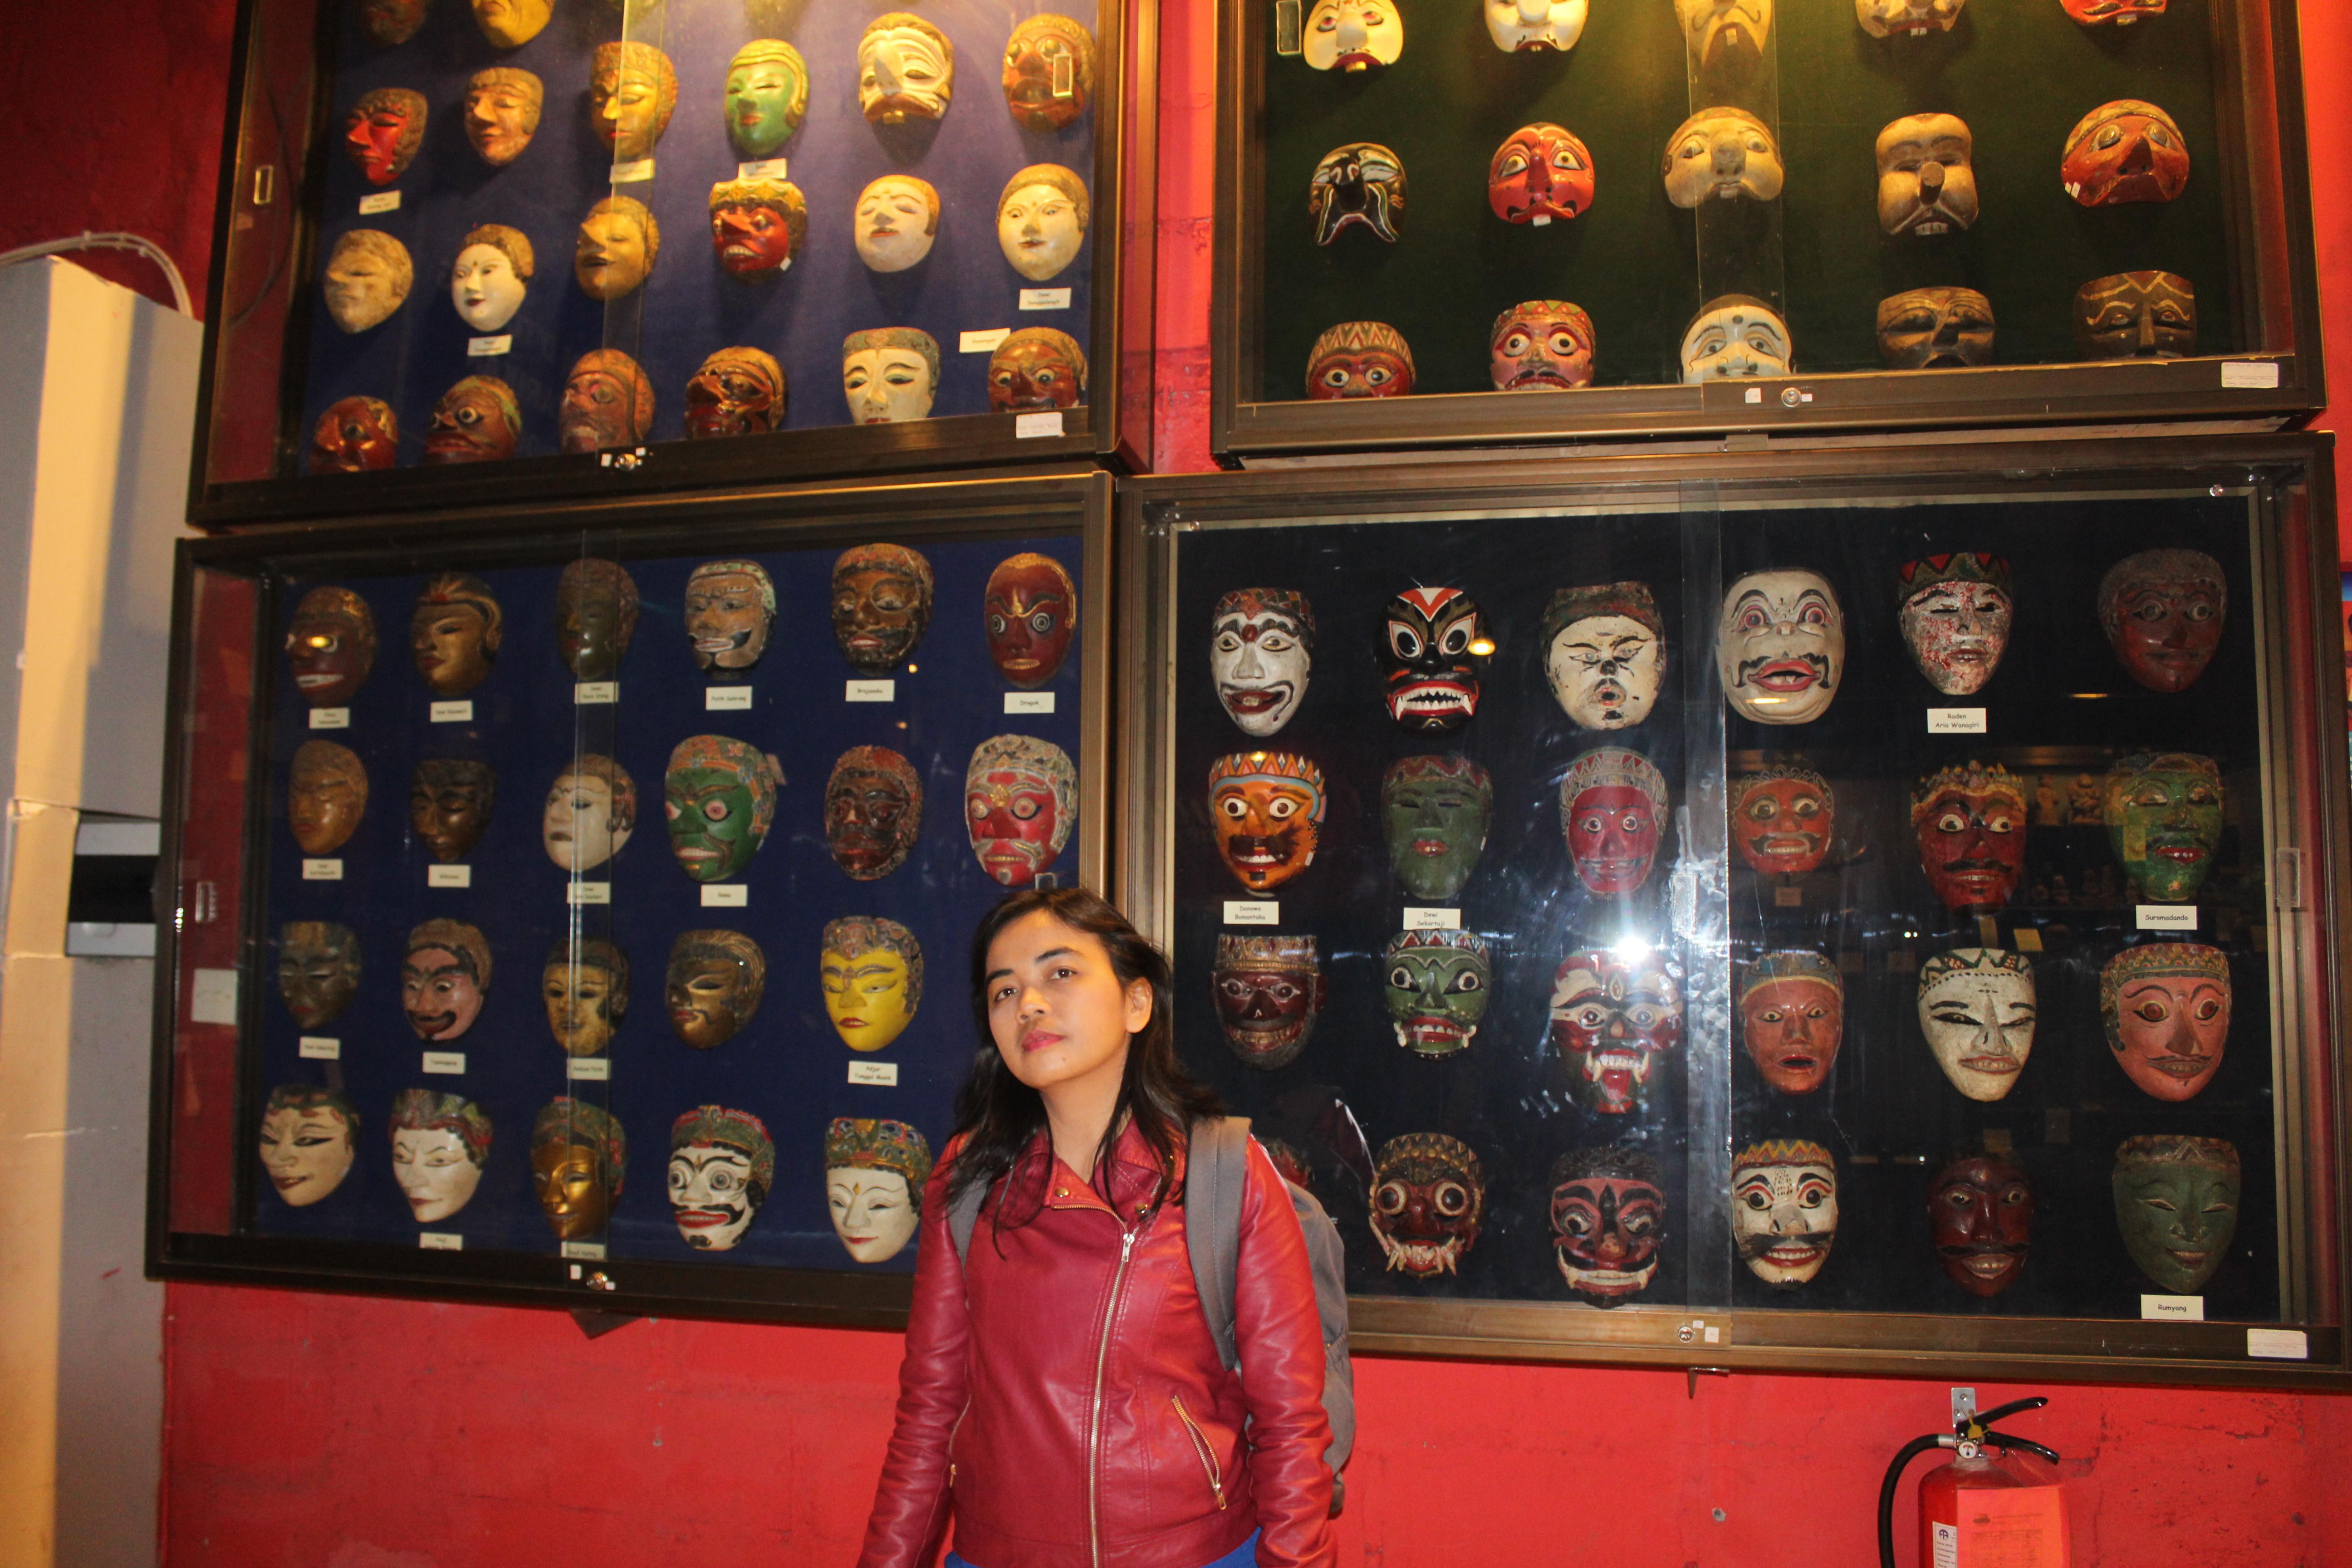 Museum Angkut Baterai Kamera Full Joeyz14 Topeng Tidak Terlalu Menikmati